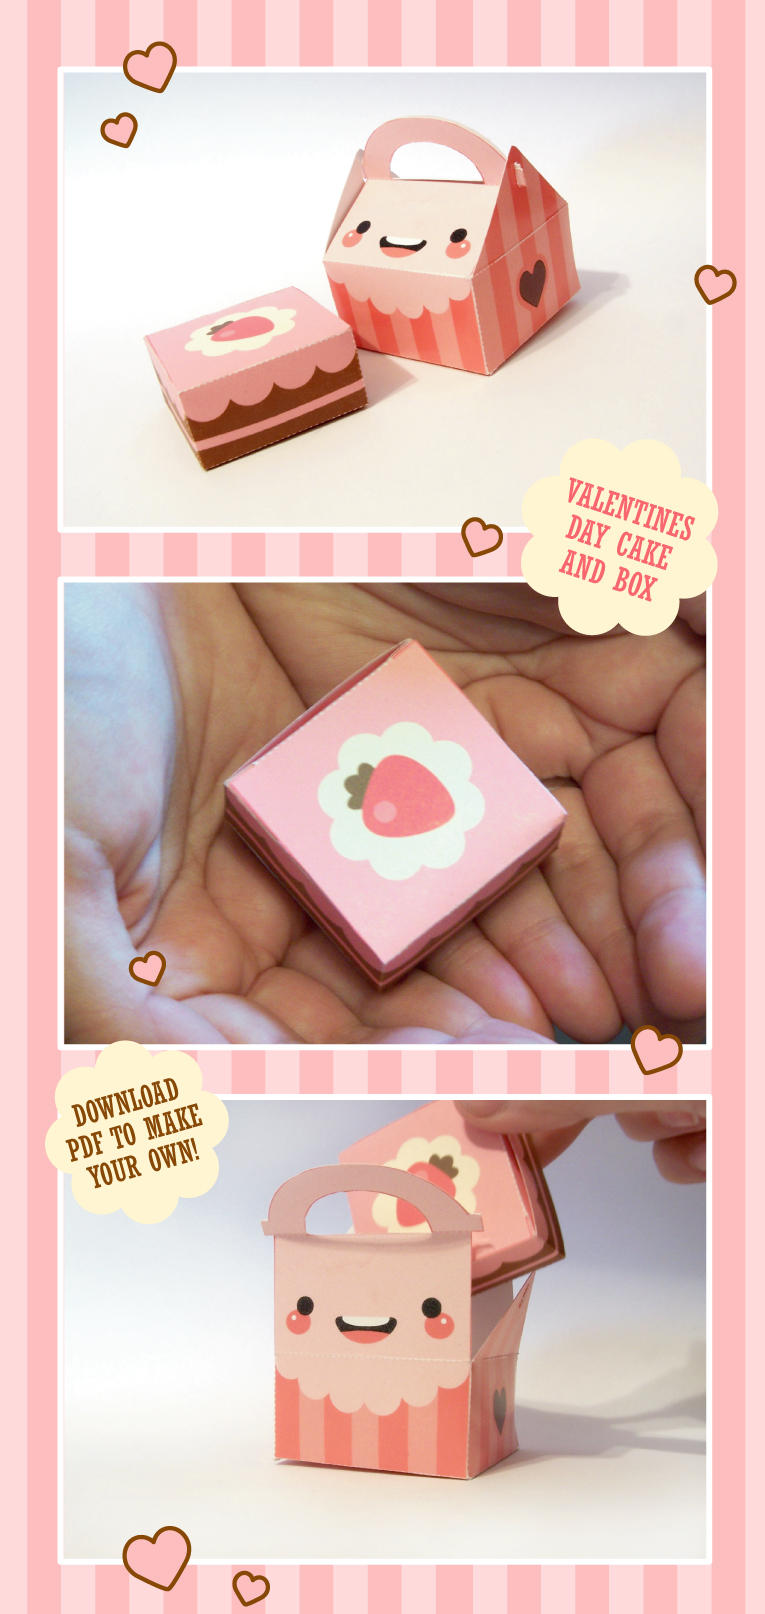 Valentines cake cake box by milkbun on deviantart valentines cake cake box by milkbun jeuxipadfo Gallery